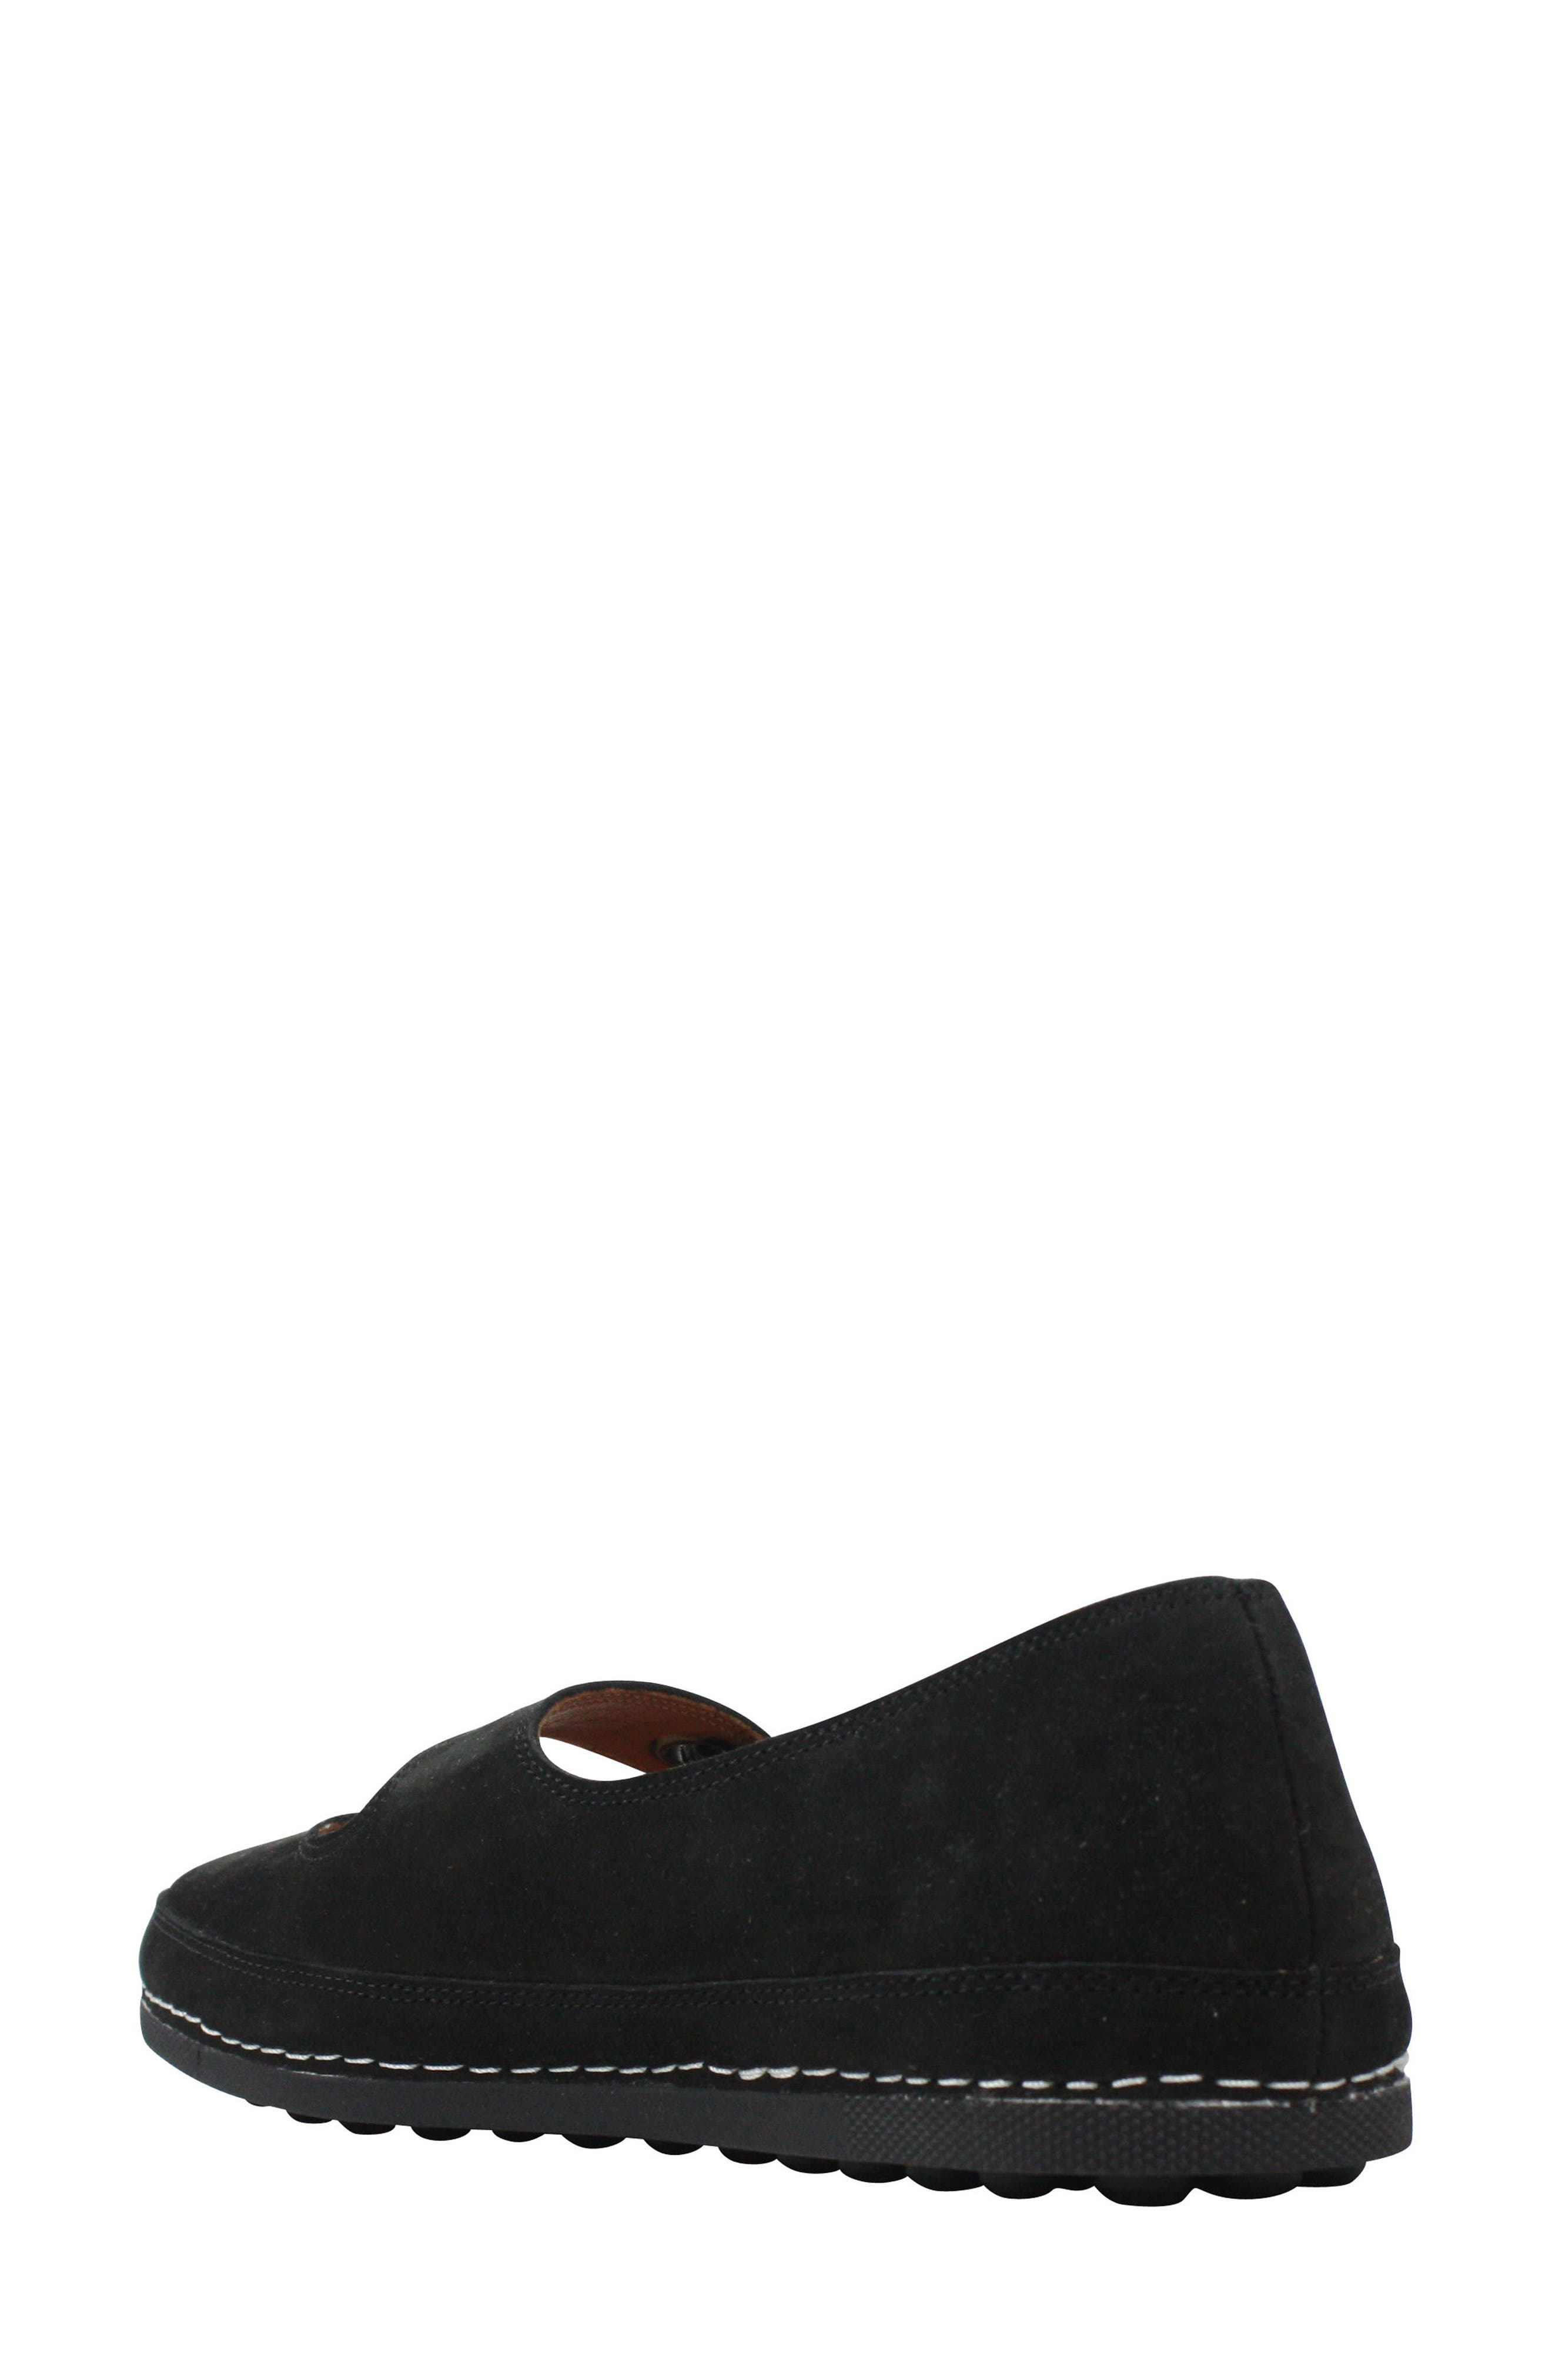 Denisse Mary Jane Flat,                             Alternate thumbnail 2, color,                             Black Nubuck Leather